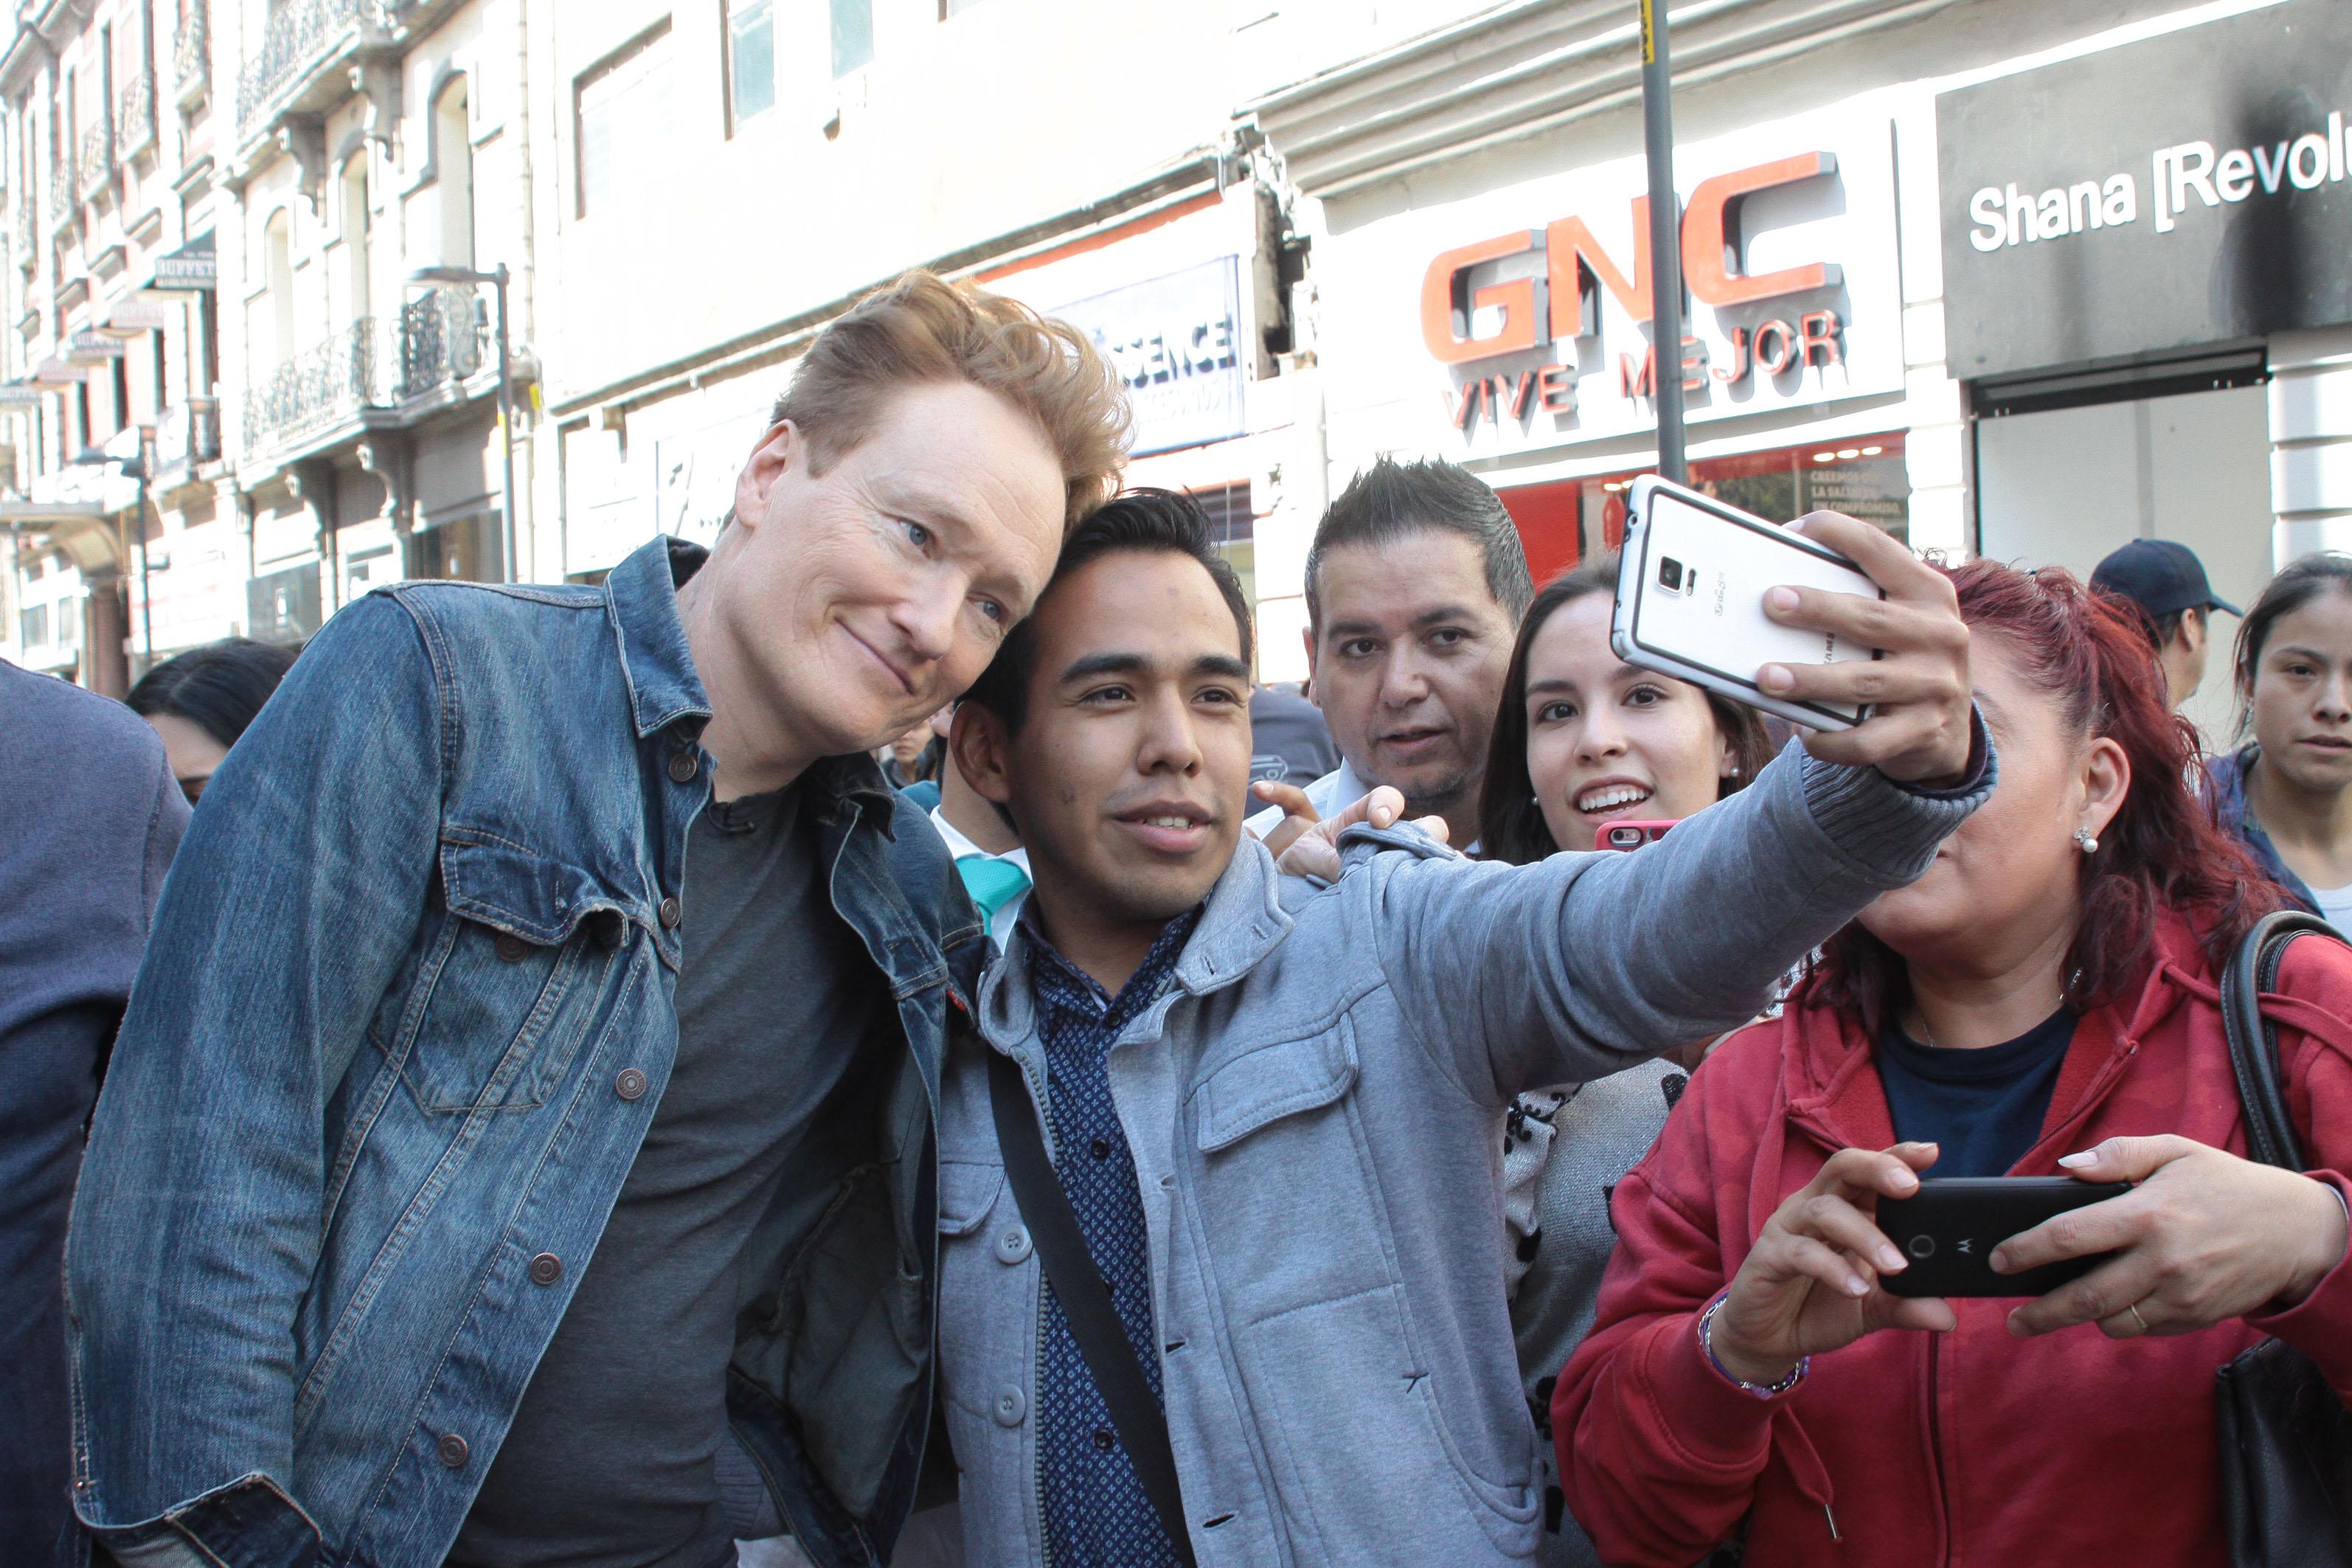 Conan O'Brien Sighting - February 16, 2017